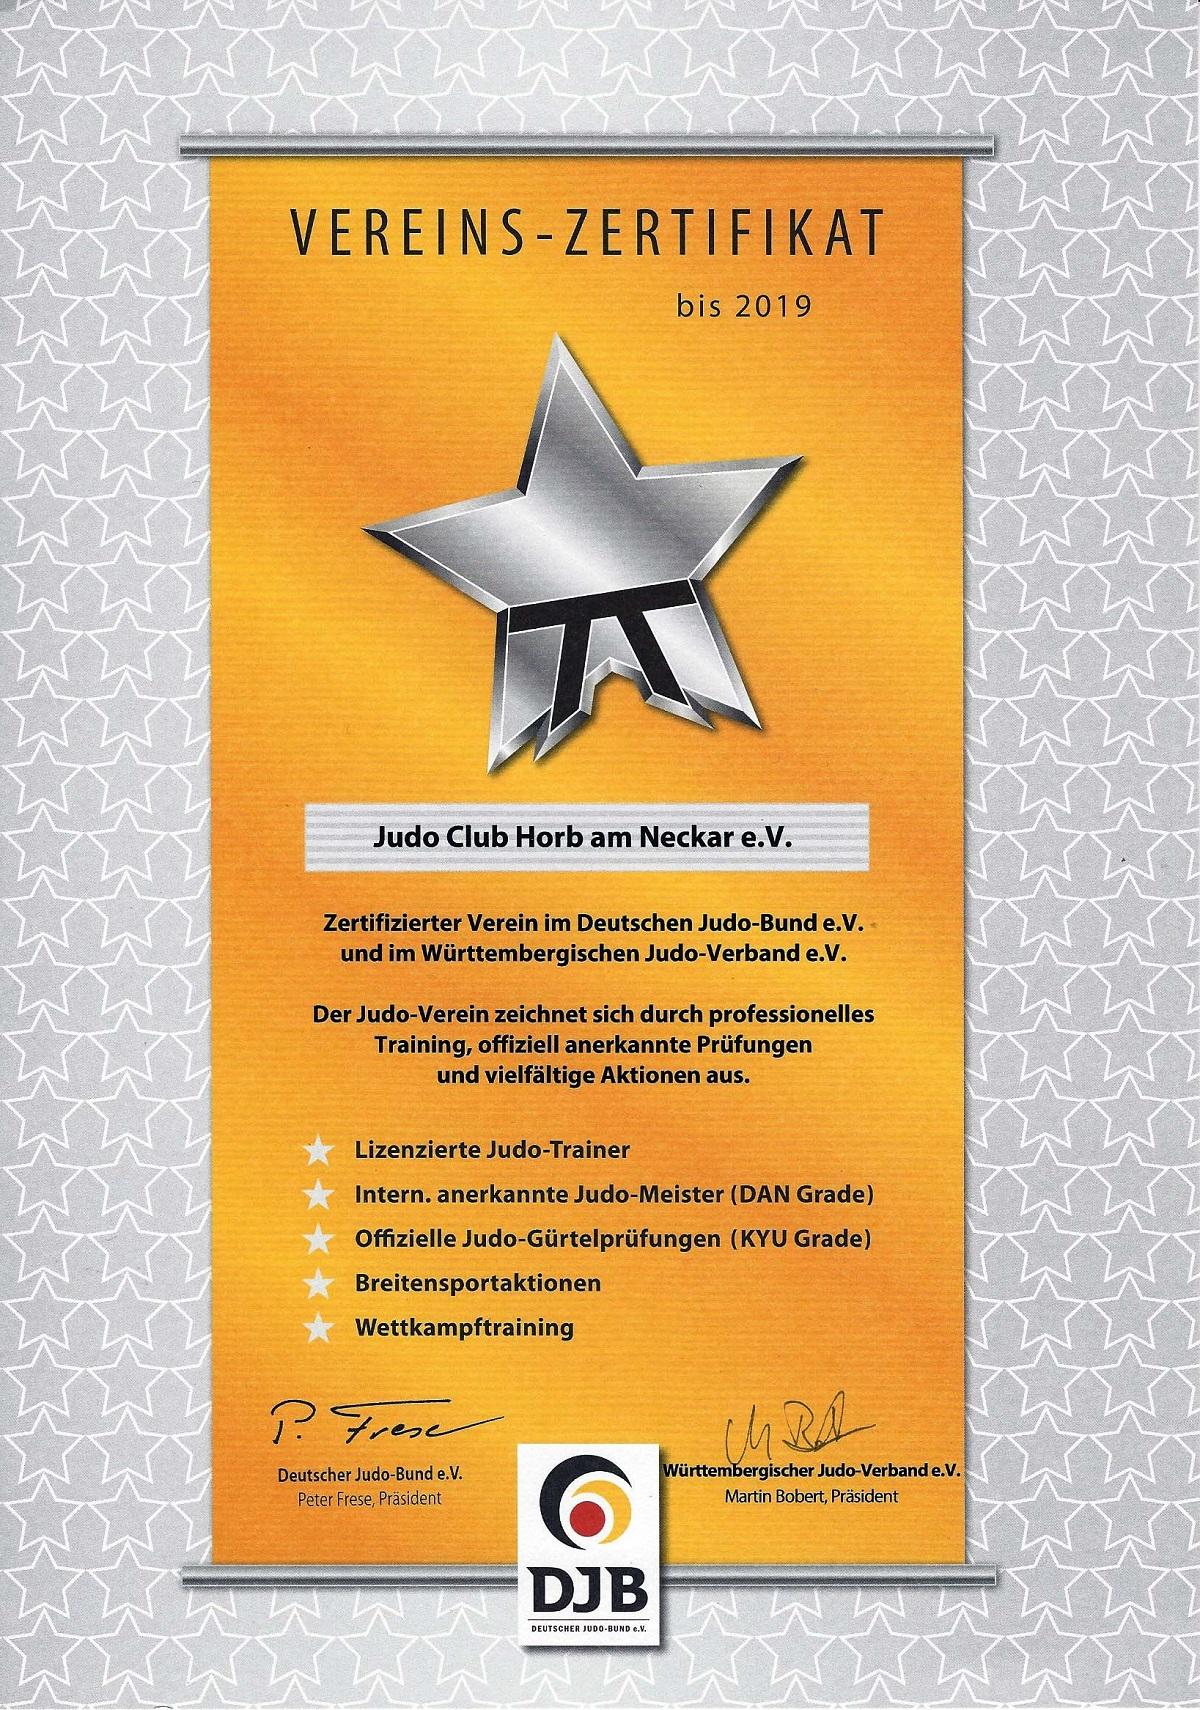 2016 Vereinszertifikat JCHorb